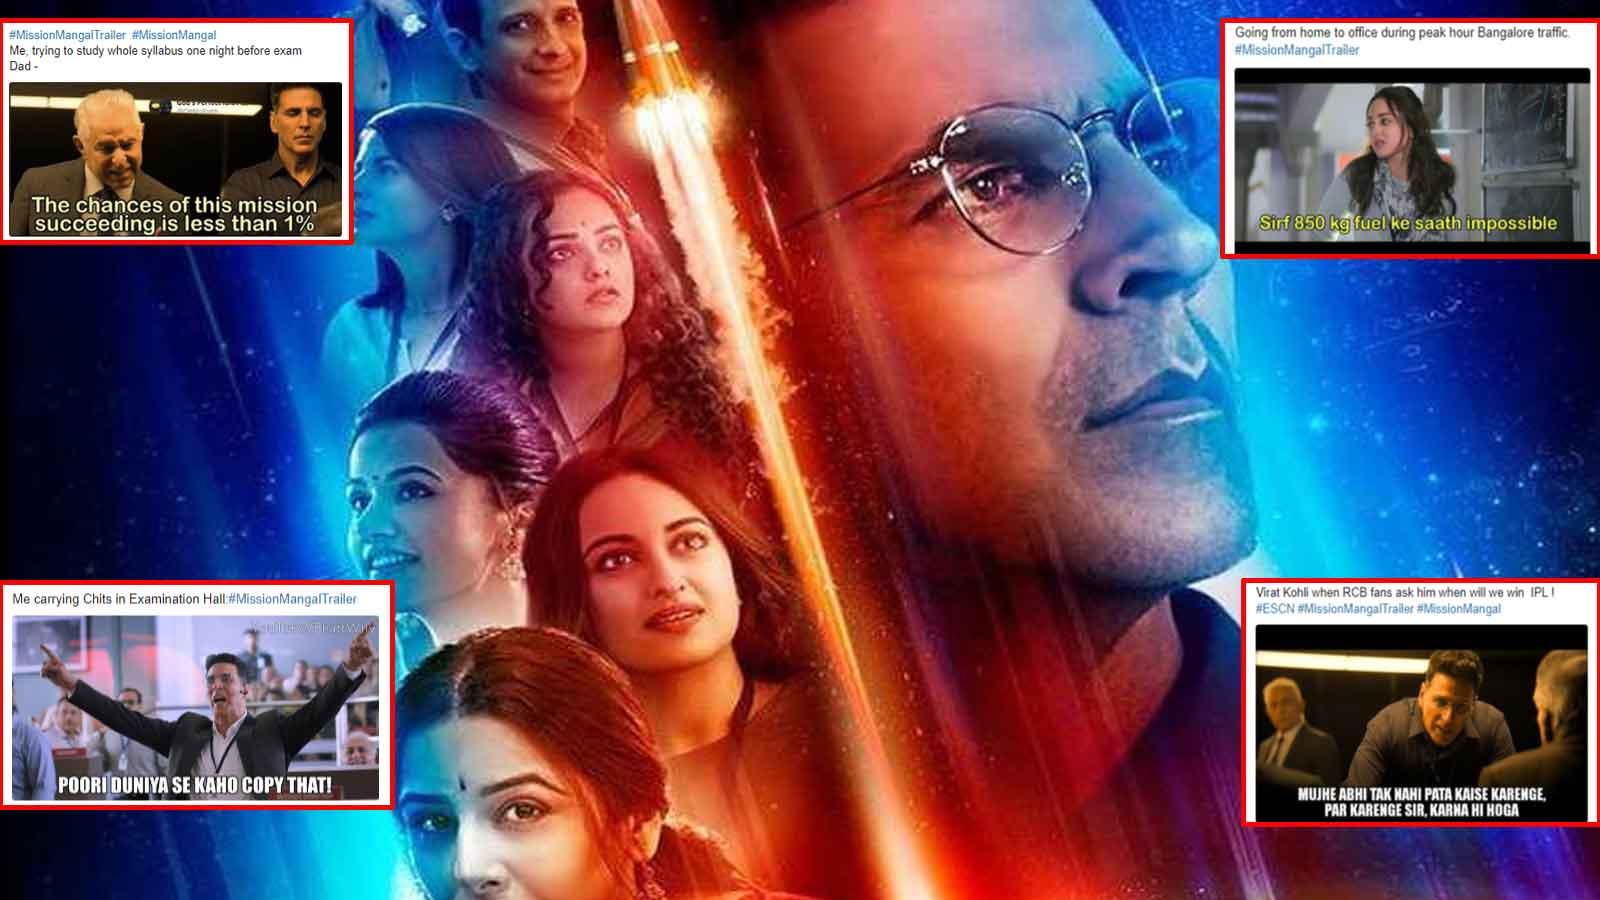 Akshay Kumar's 'Mission Mangal' trailer gives rise to hilarious meme fest